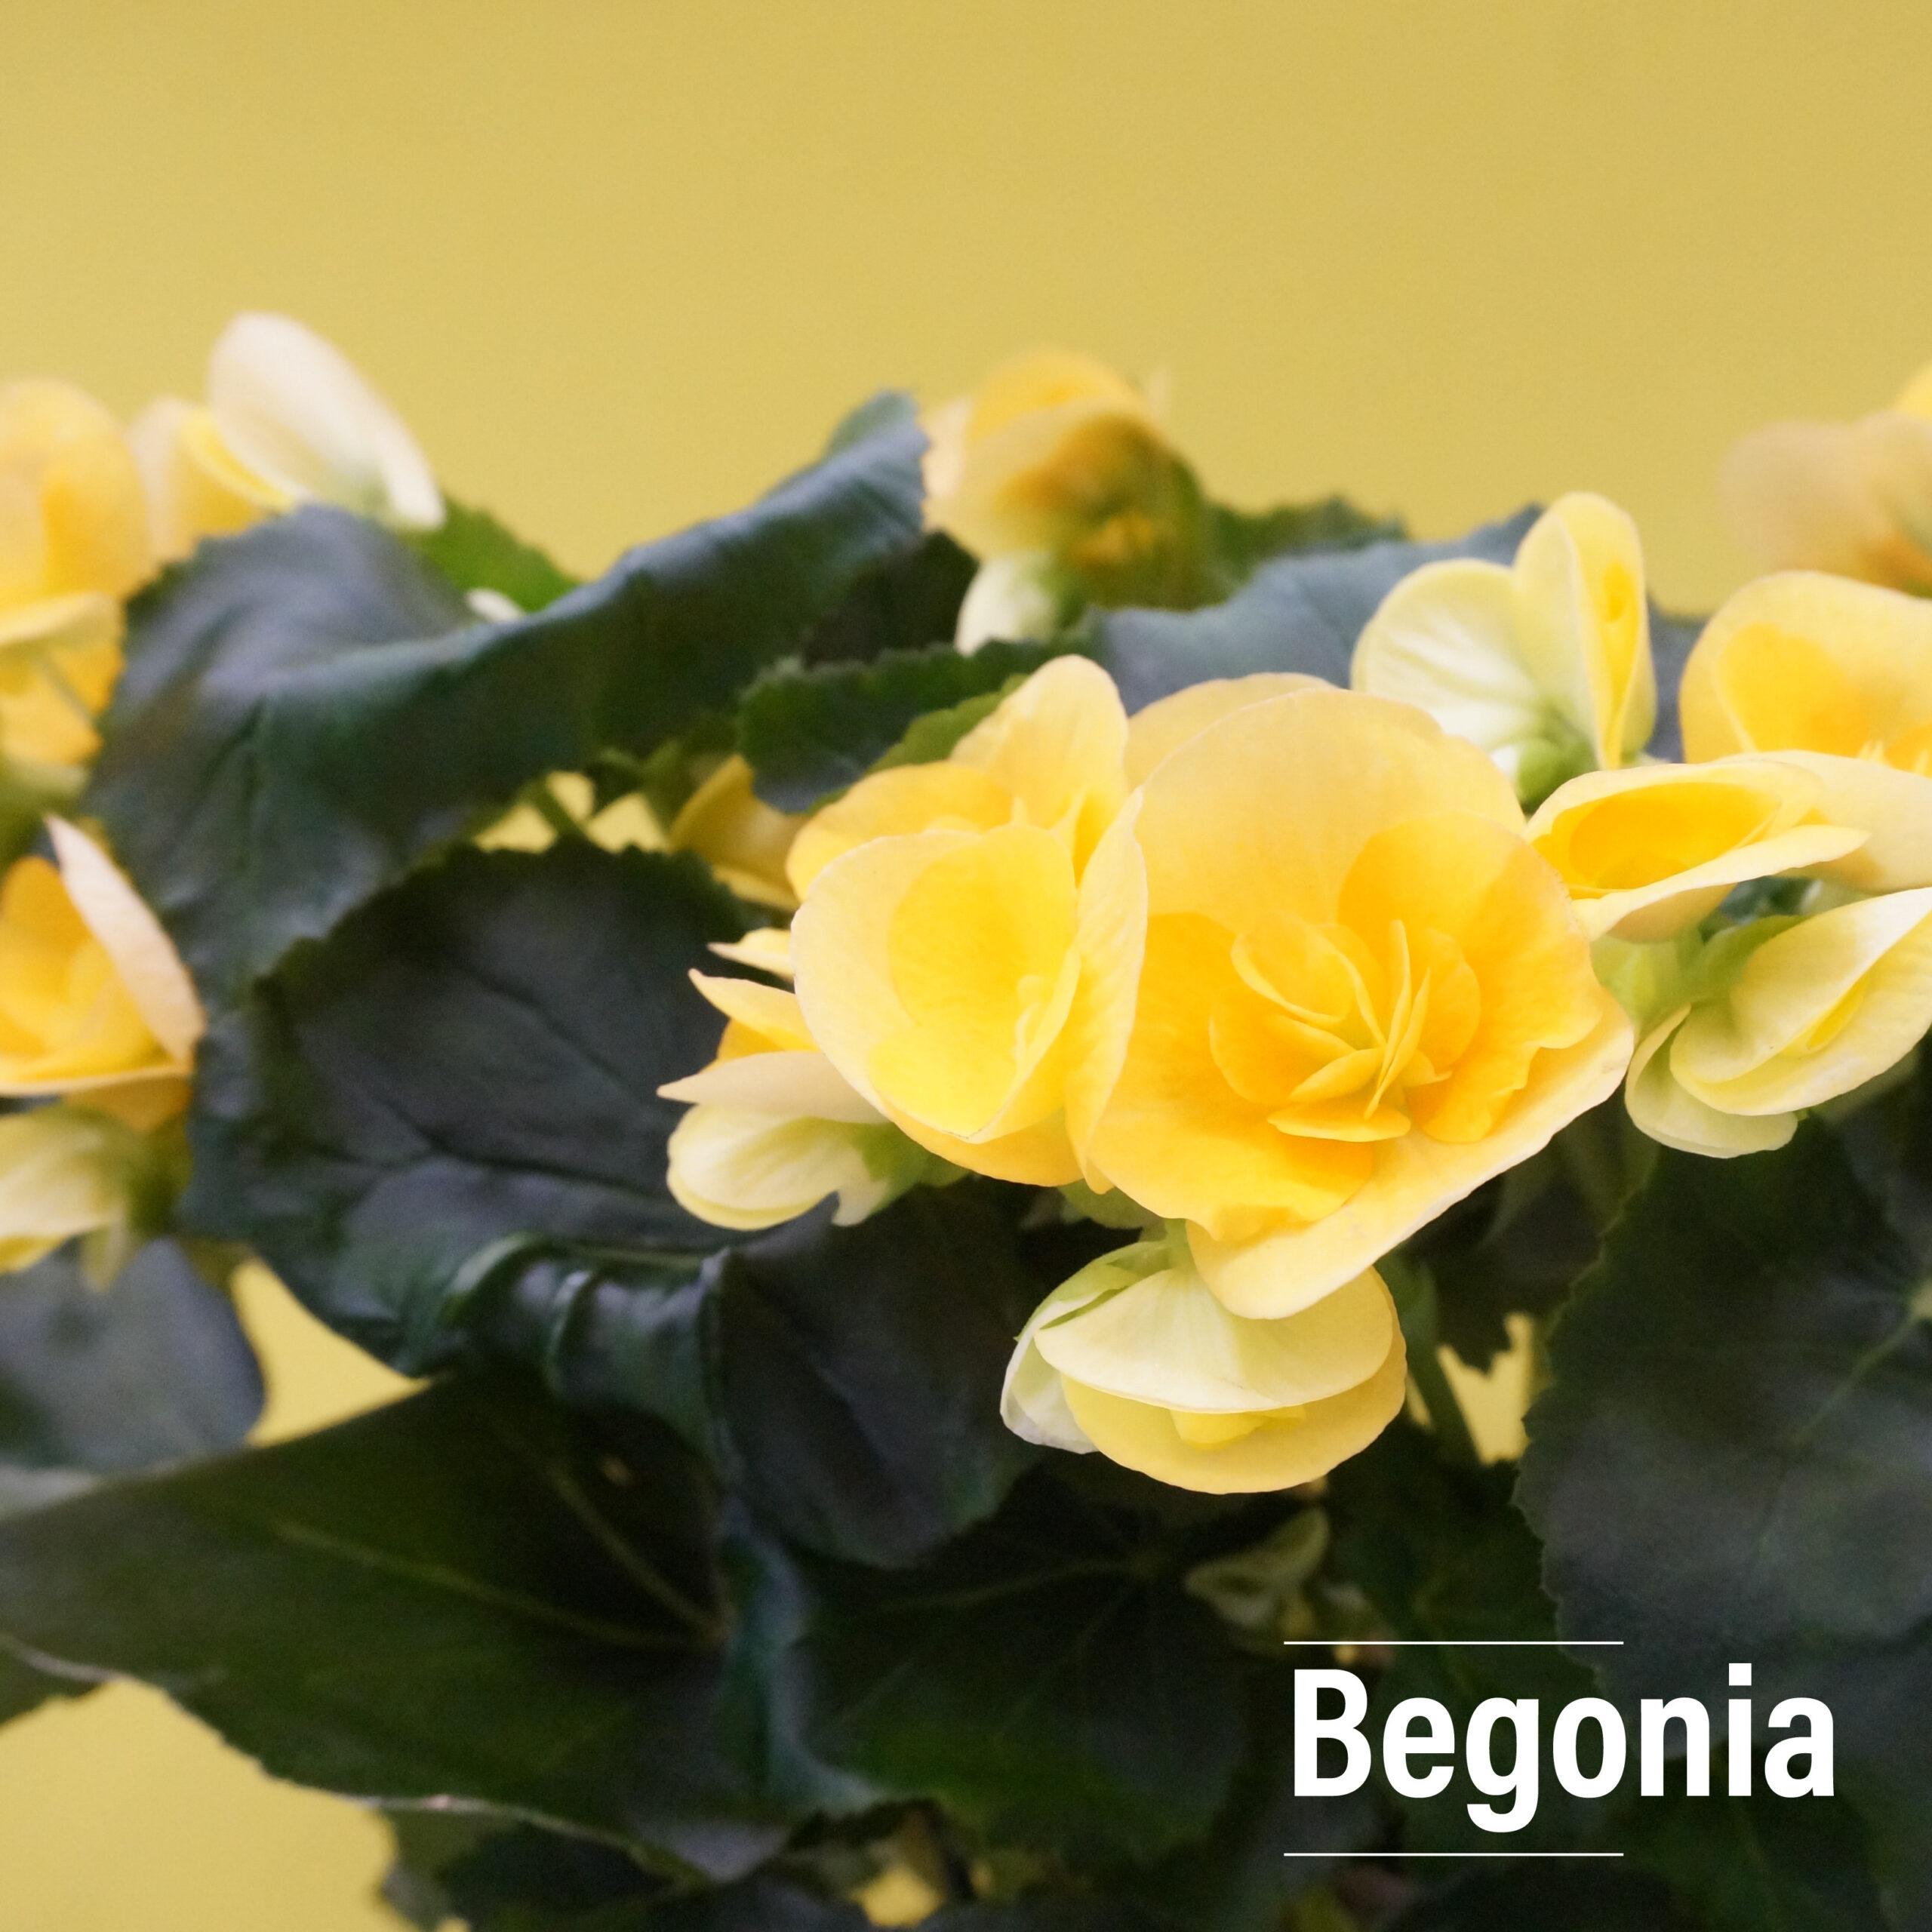 Seasonal Begonia flowers are wide petaled and multi flowered